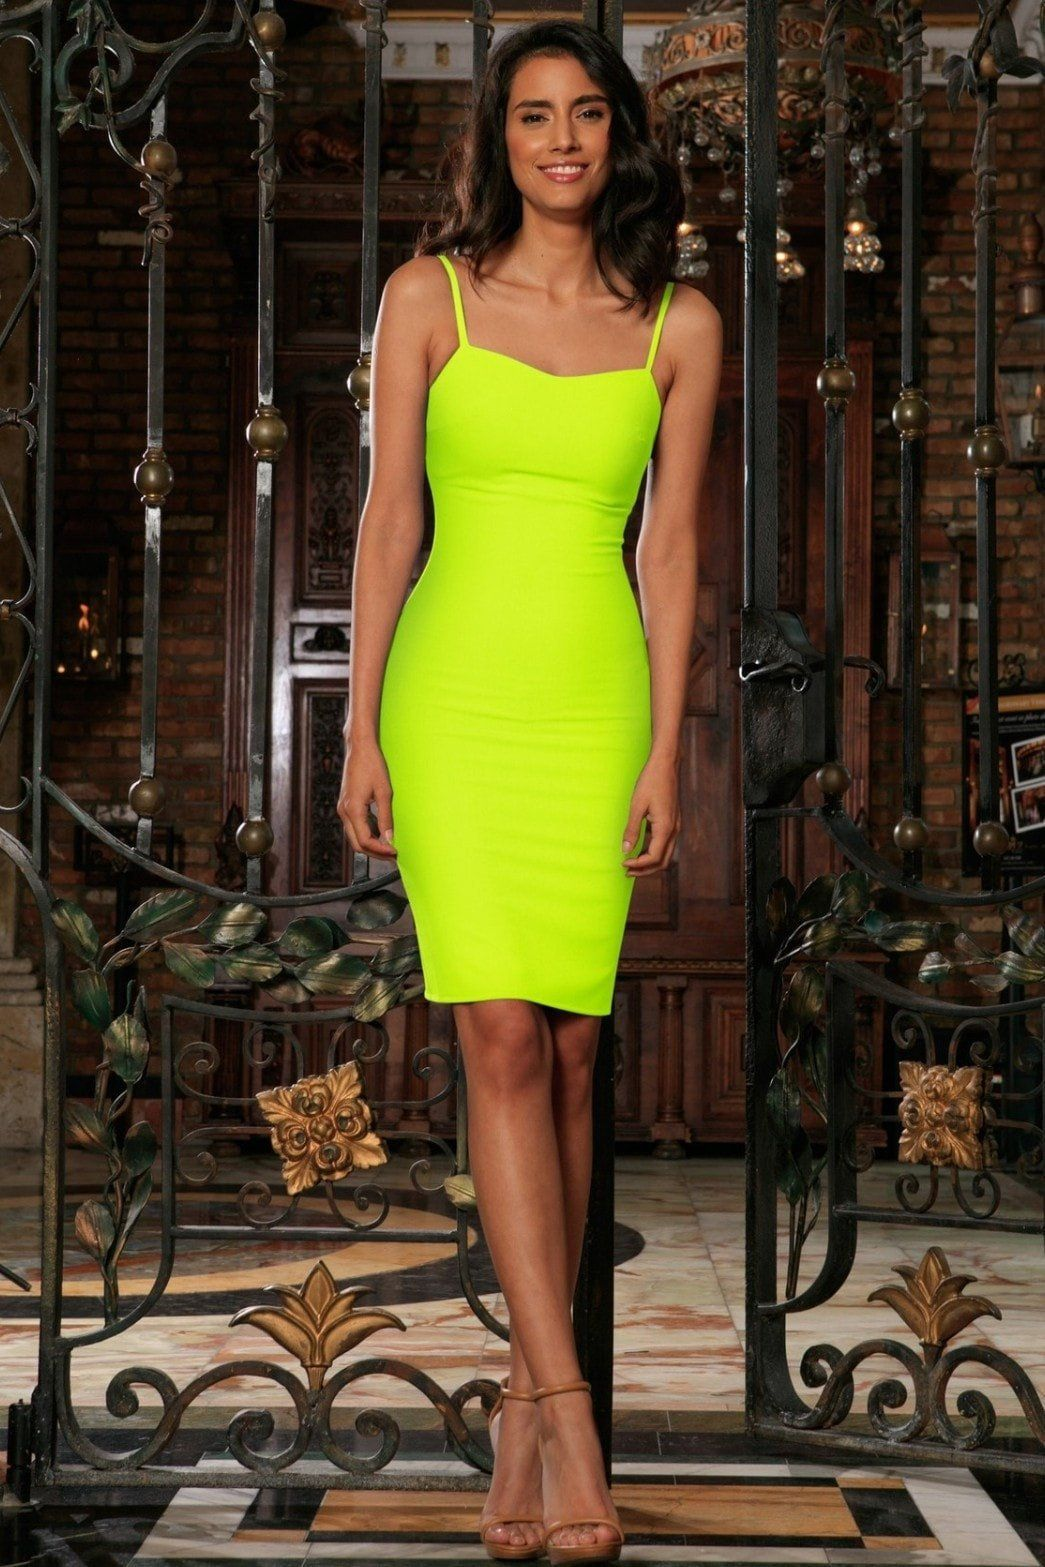 Neon Yellow Lime Green Stretchy Summer Trendy Bodycon Mini Dress - Women bfa3290223